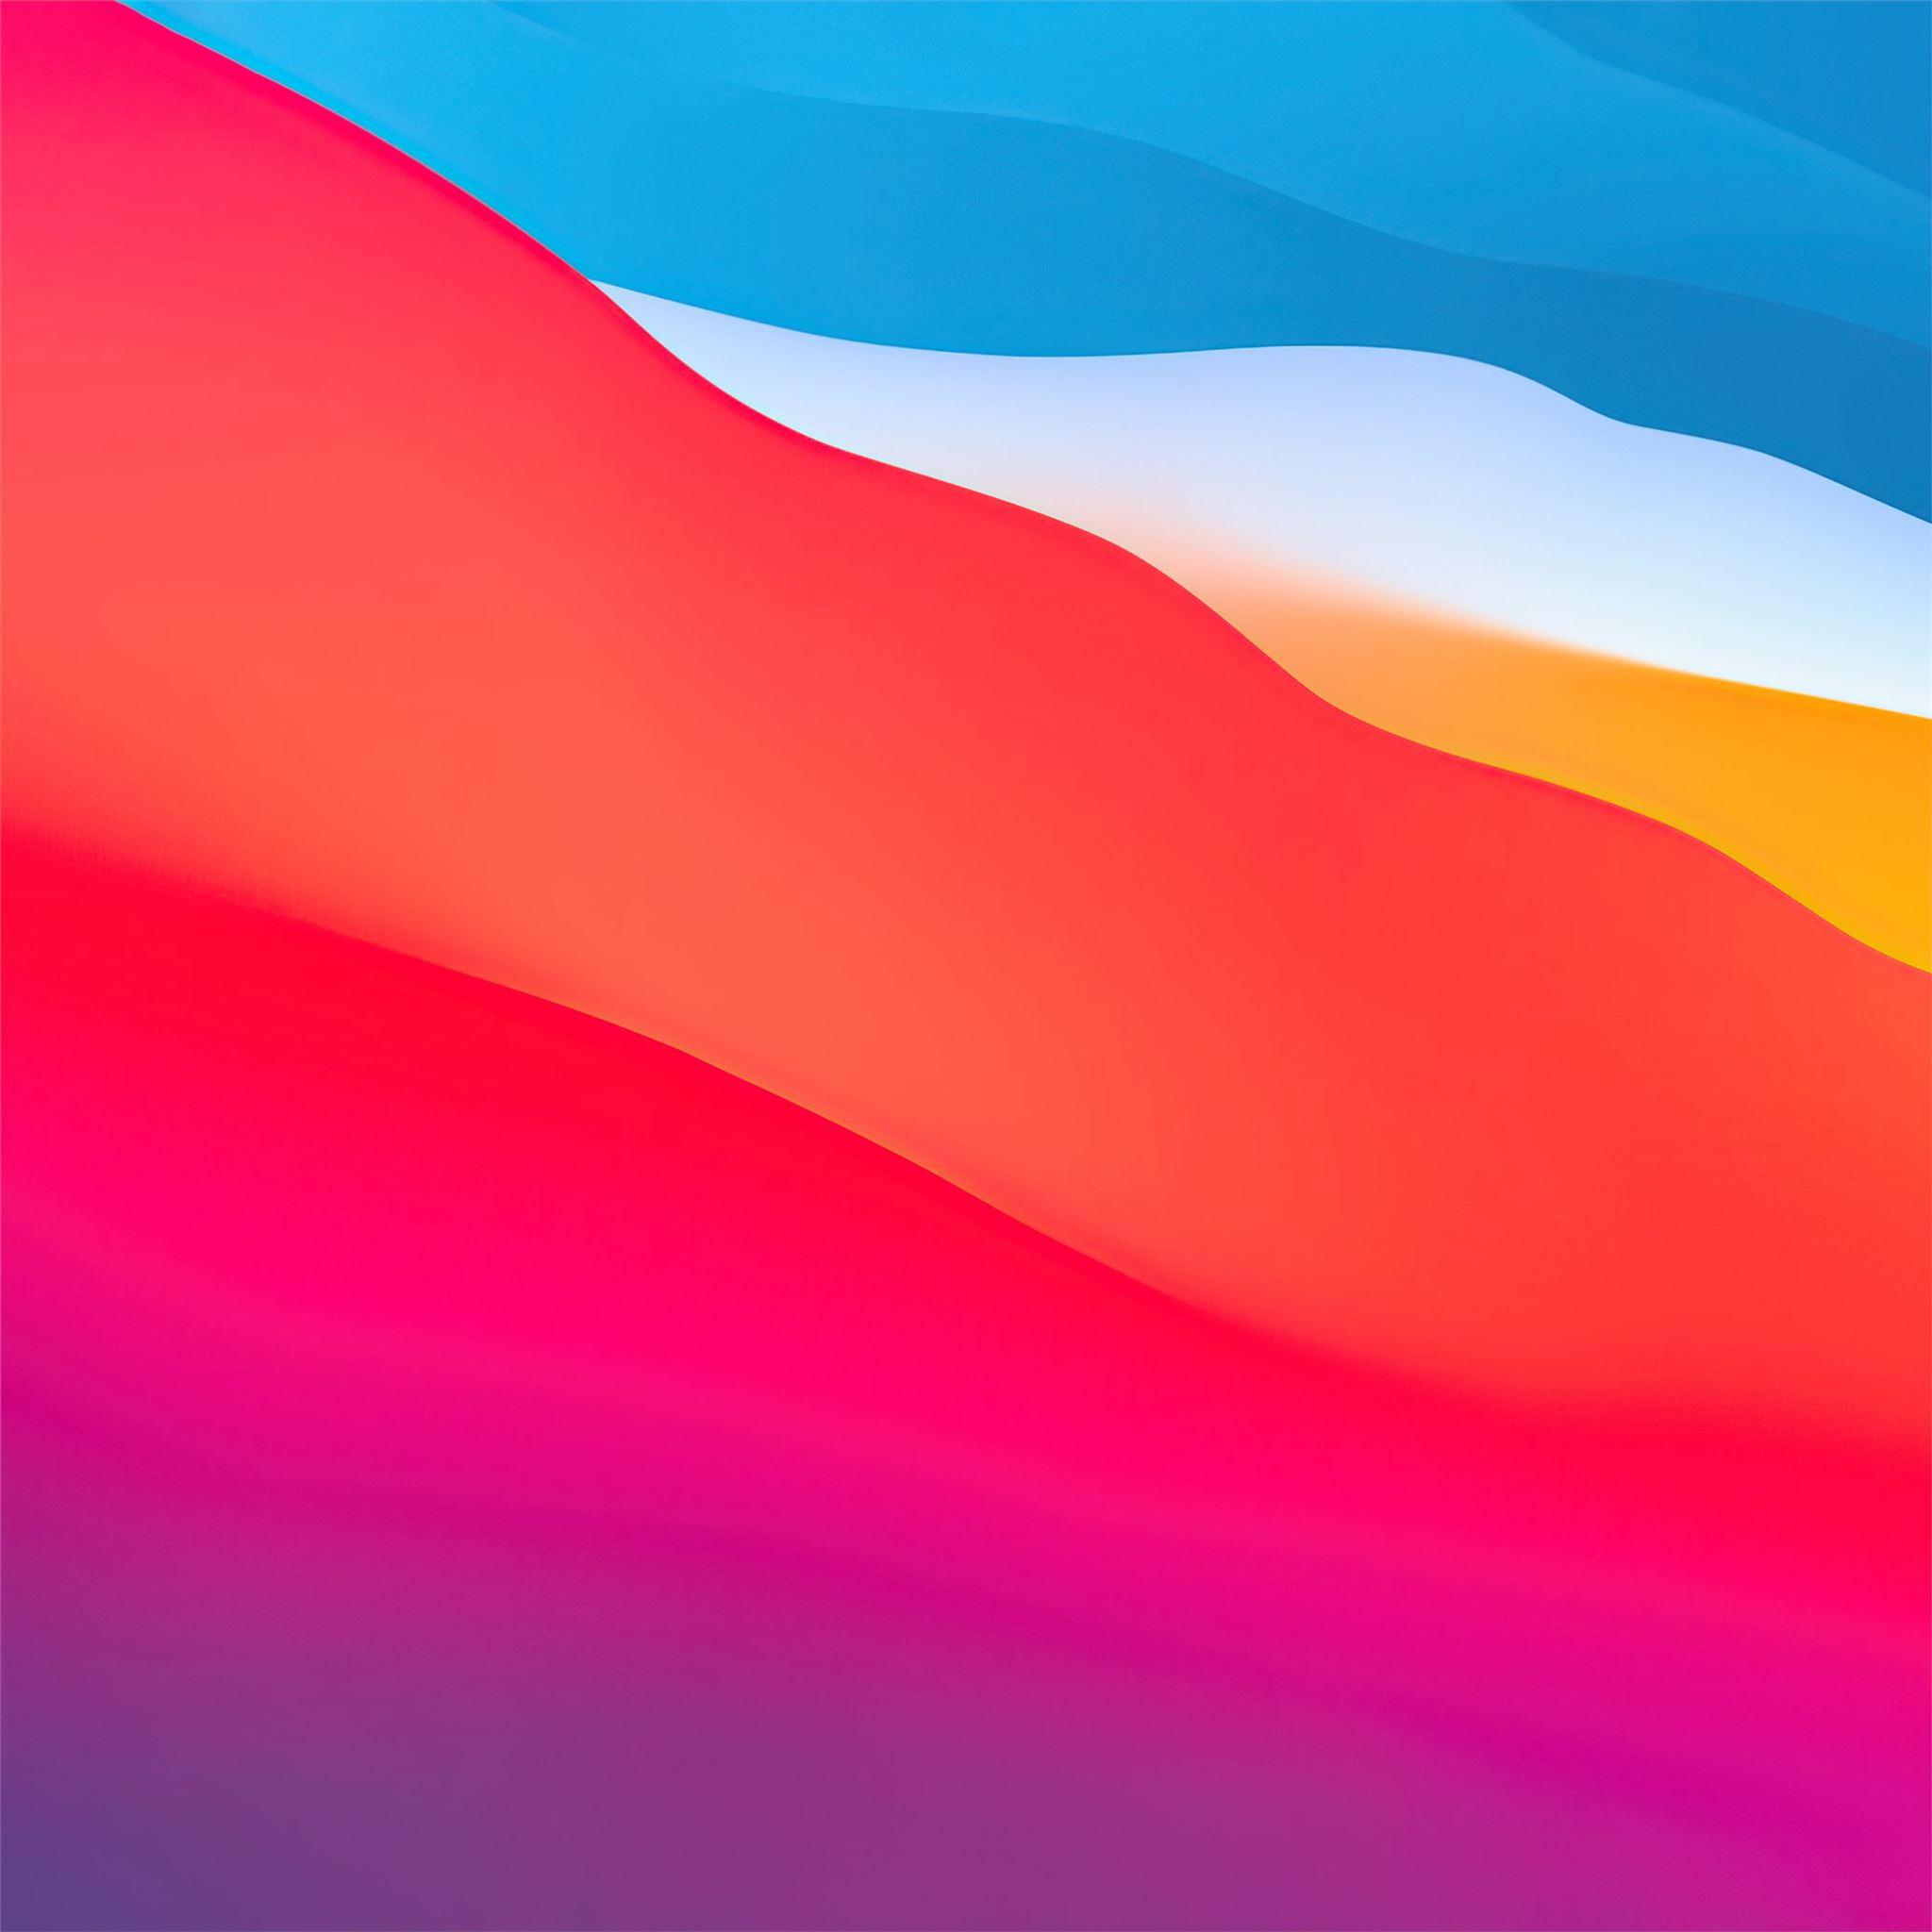 Ios 14 Stock 4k Ipad Pro Wallpapers Free Download